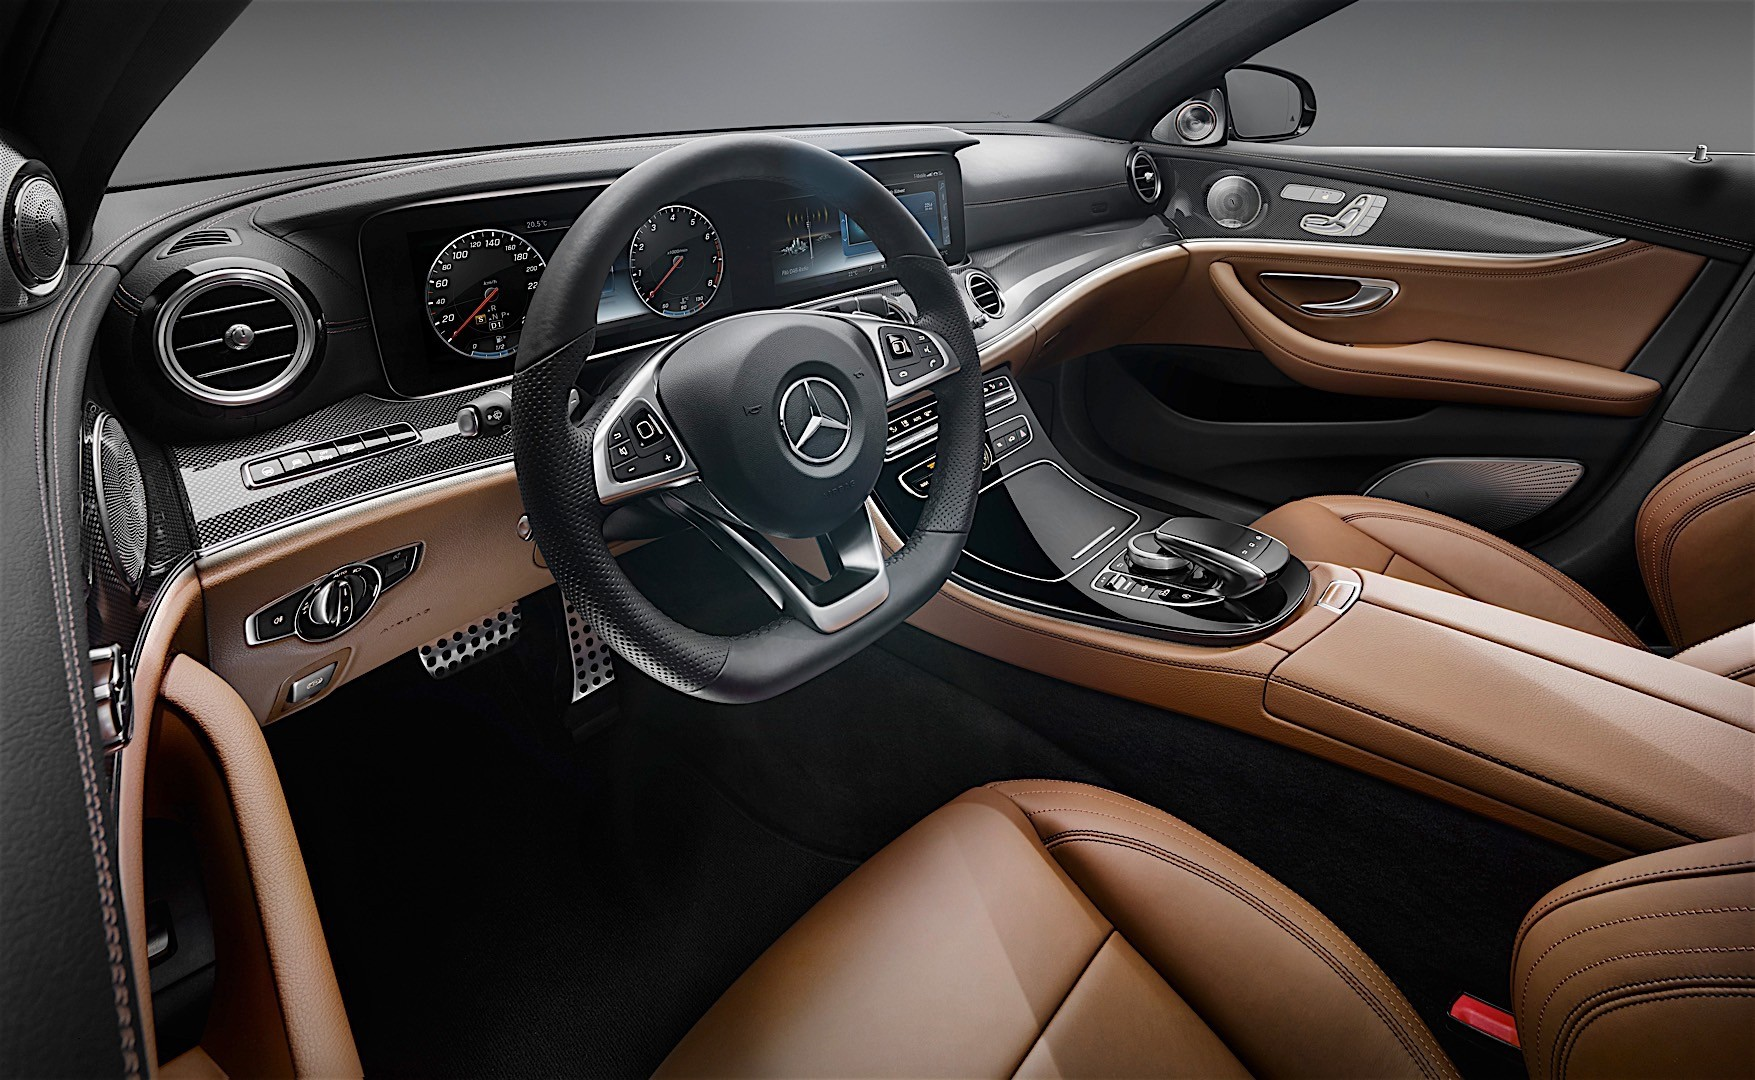 Noul Sprinter 2018 >> 2017 Mercedes-Benz E-Class Interior Officially Unveiled, Will Rival the S-Class - autoevolution